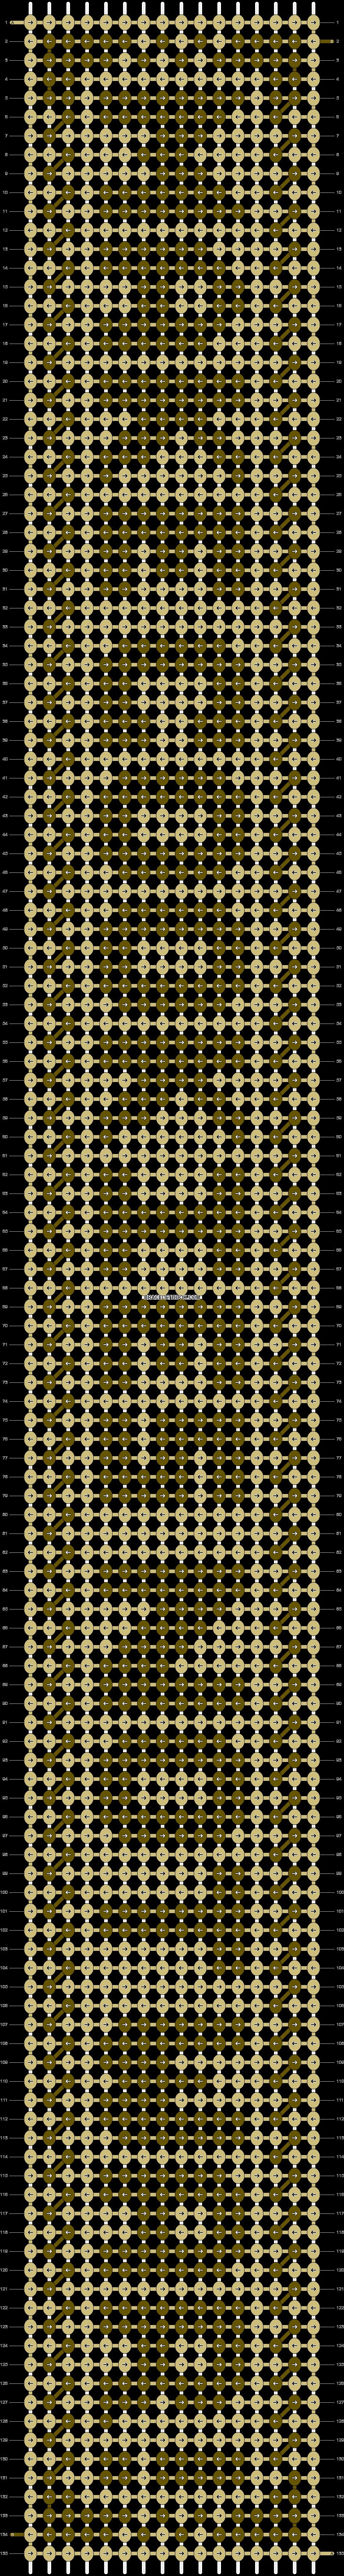 Alpha pattern #4375 pattern